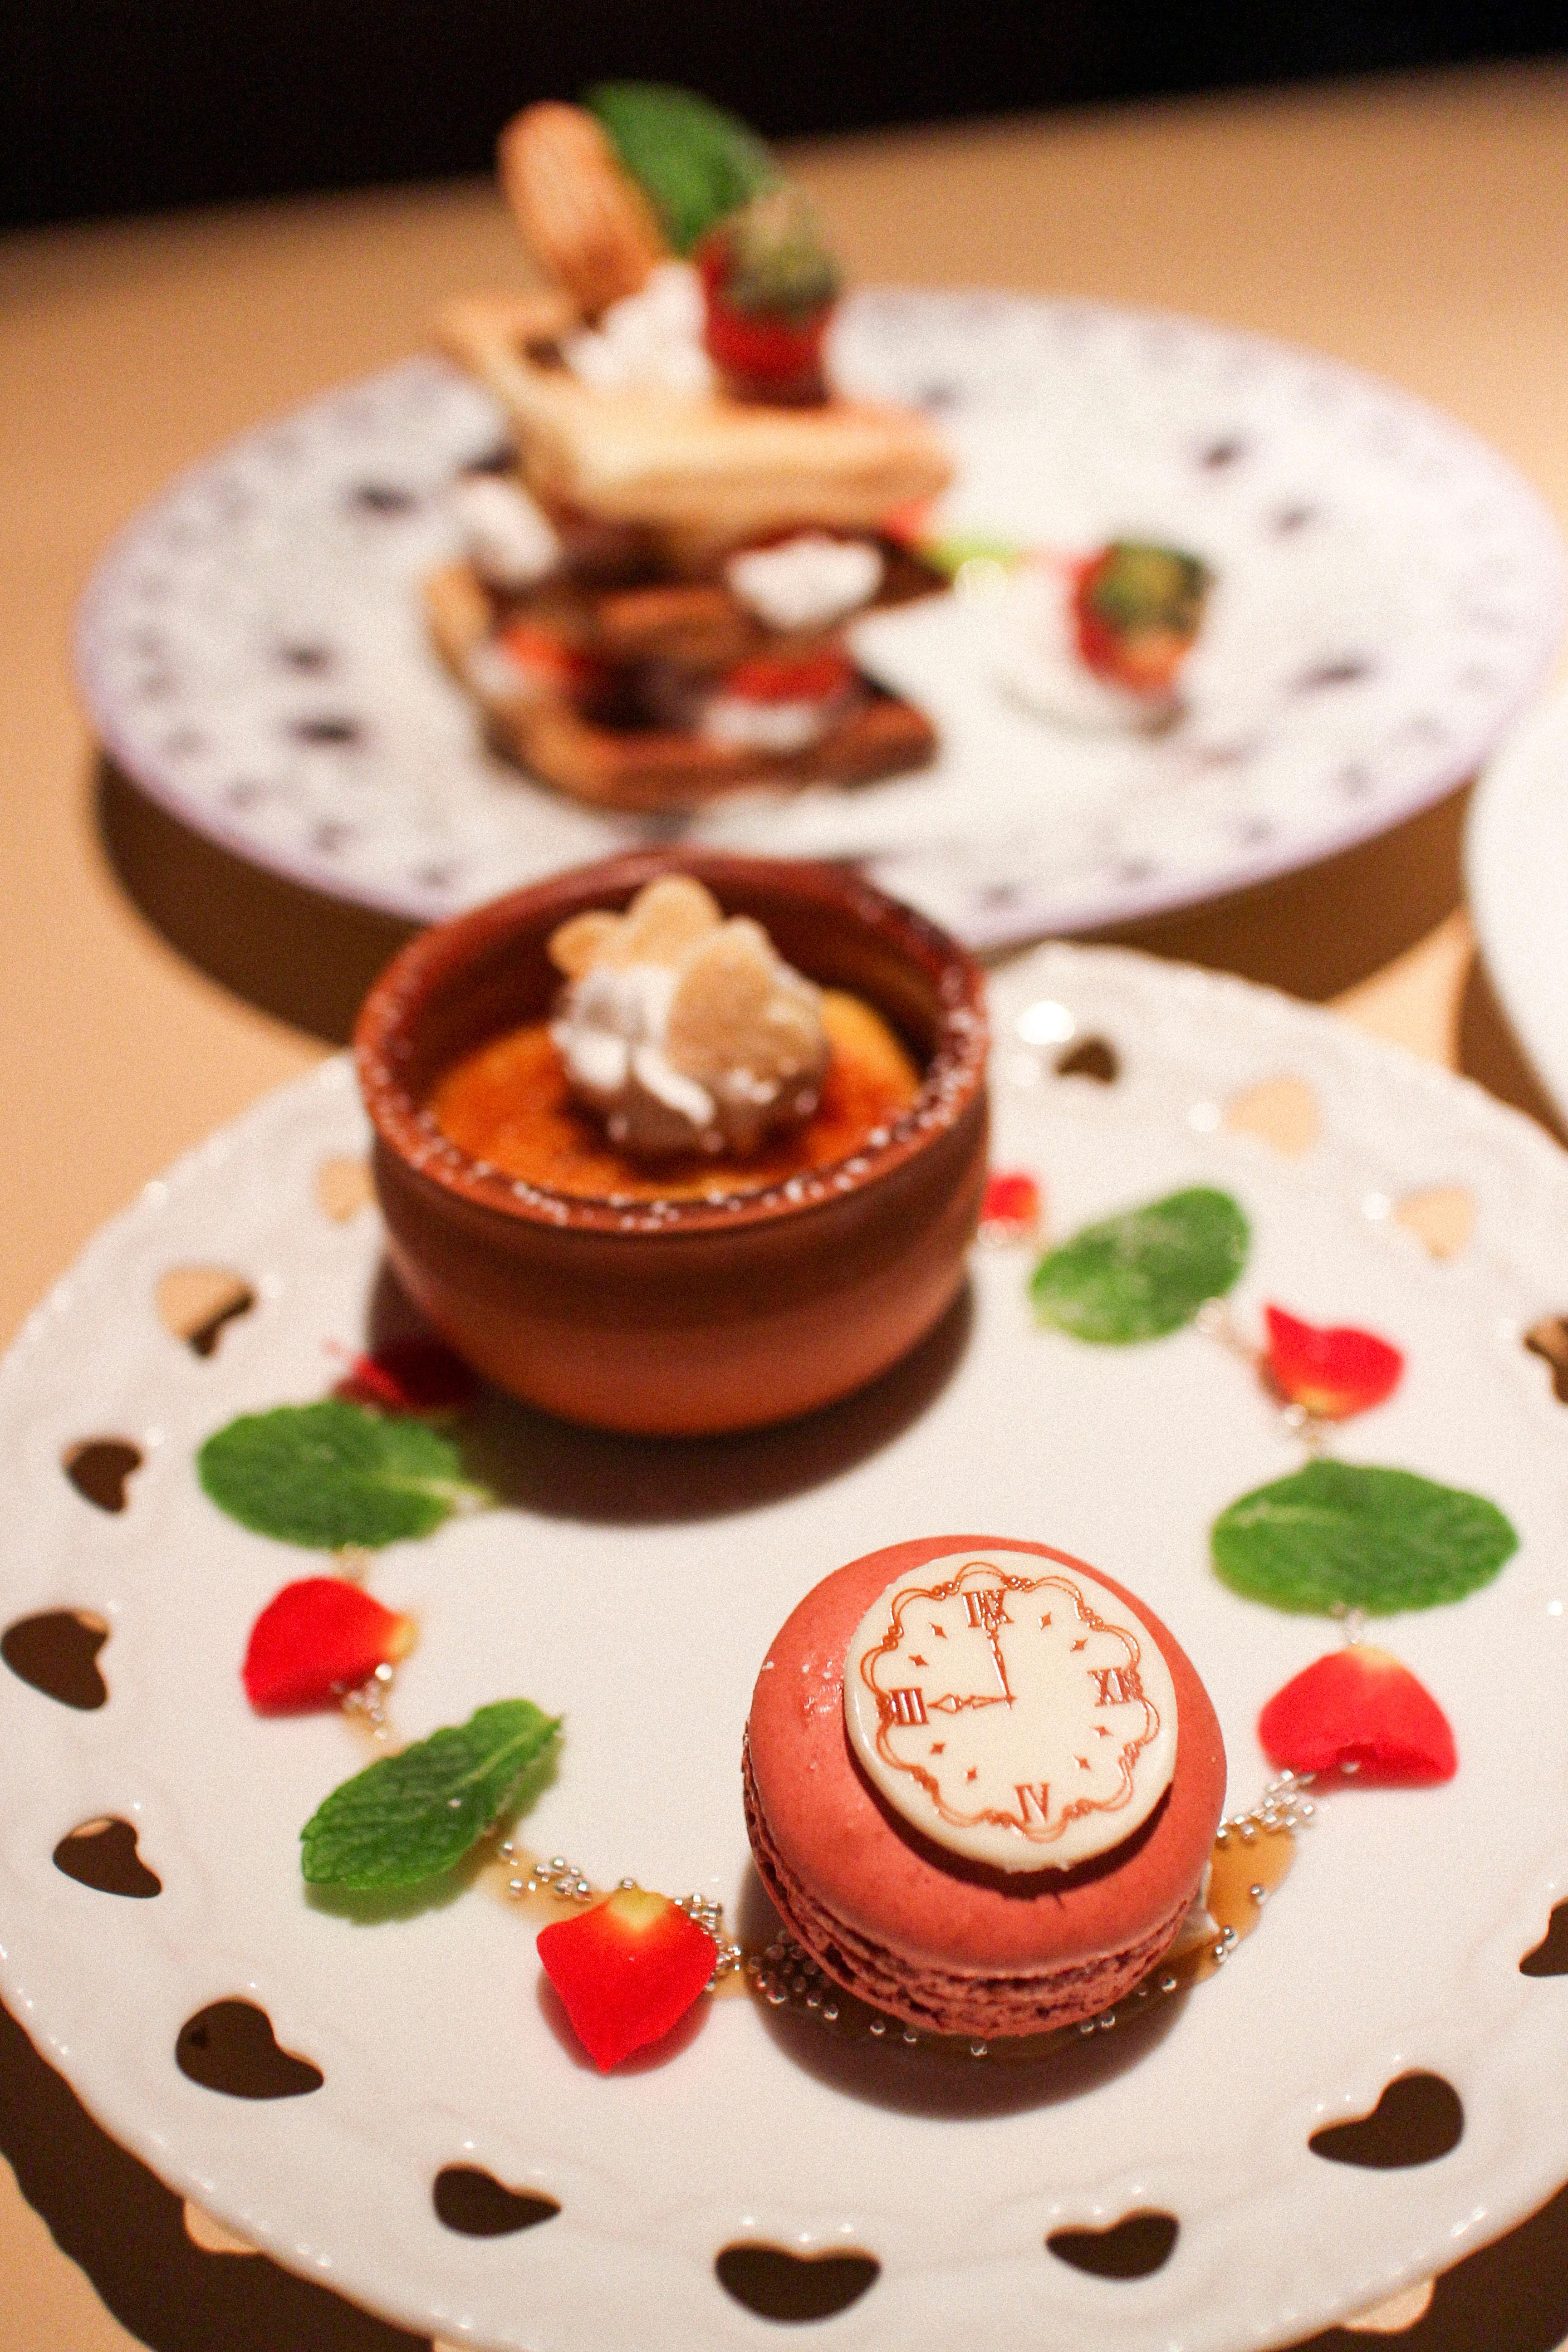 Alice_in_Wonderland_Fantasy_Dining_Tokyo_06